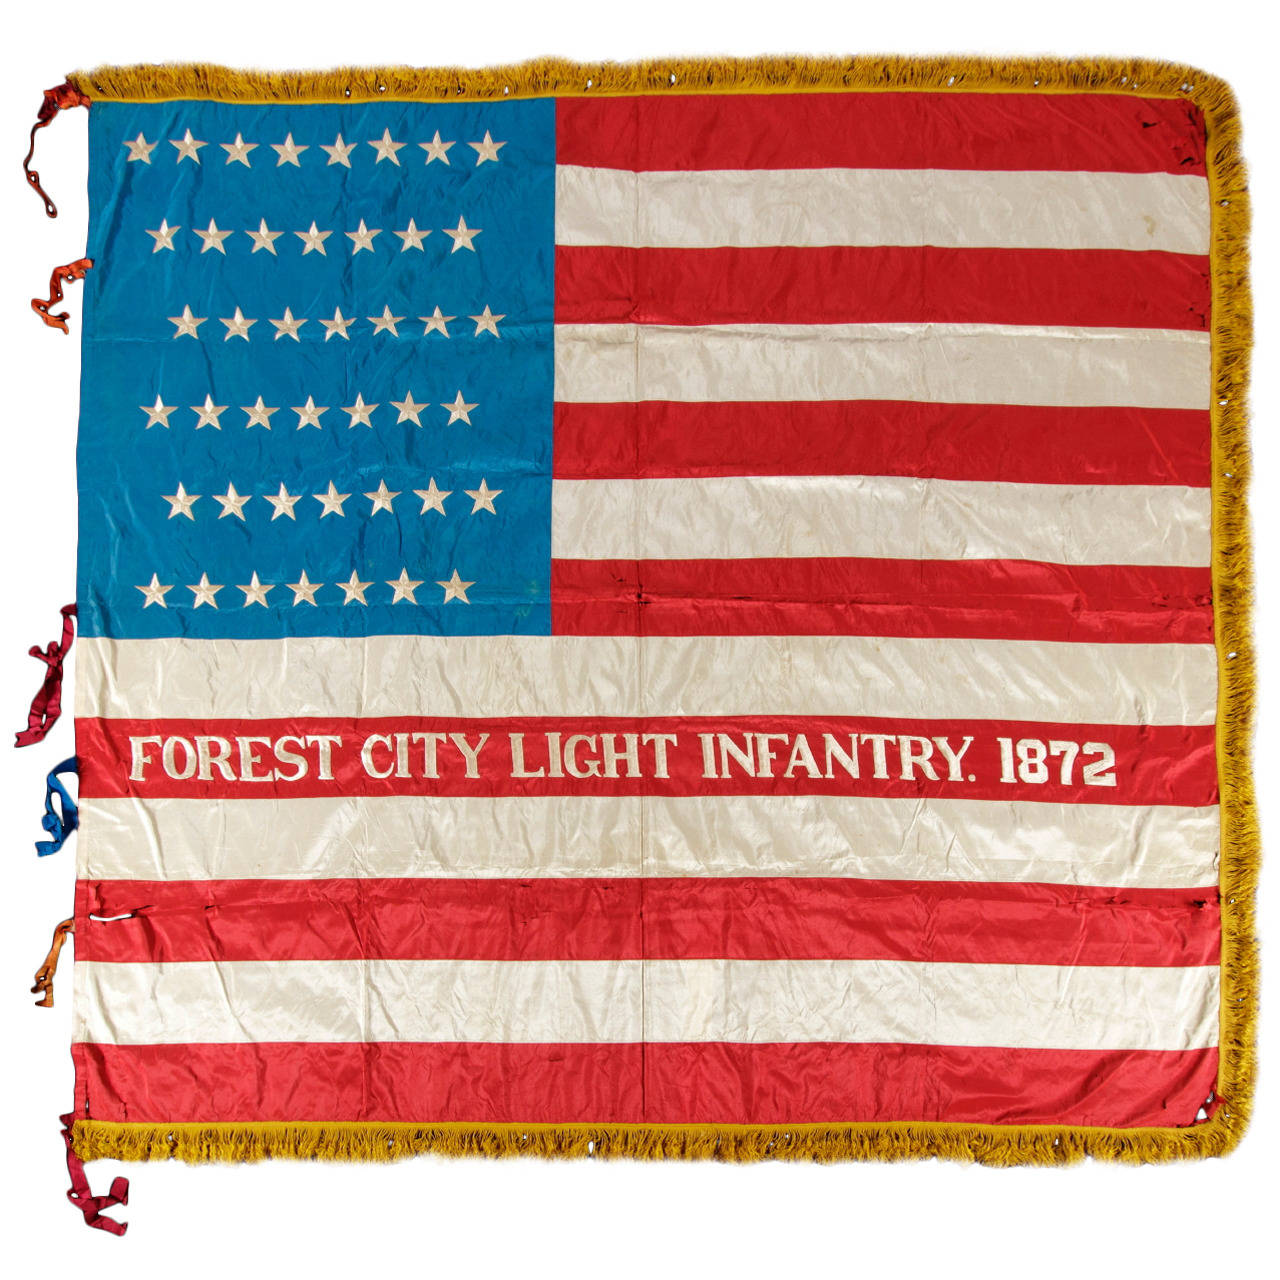 43 Star, Idaho Statehood, American Flag